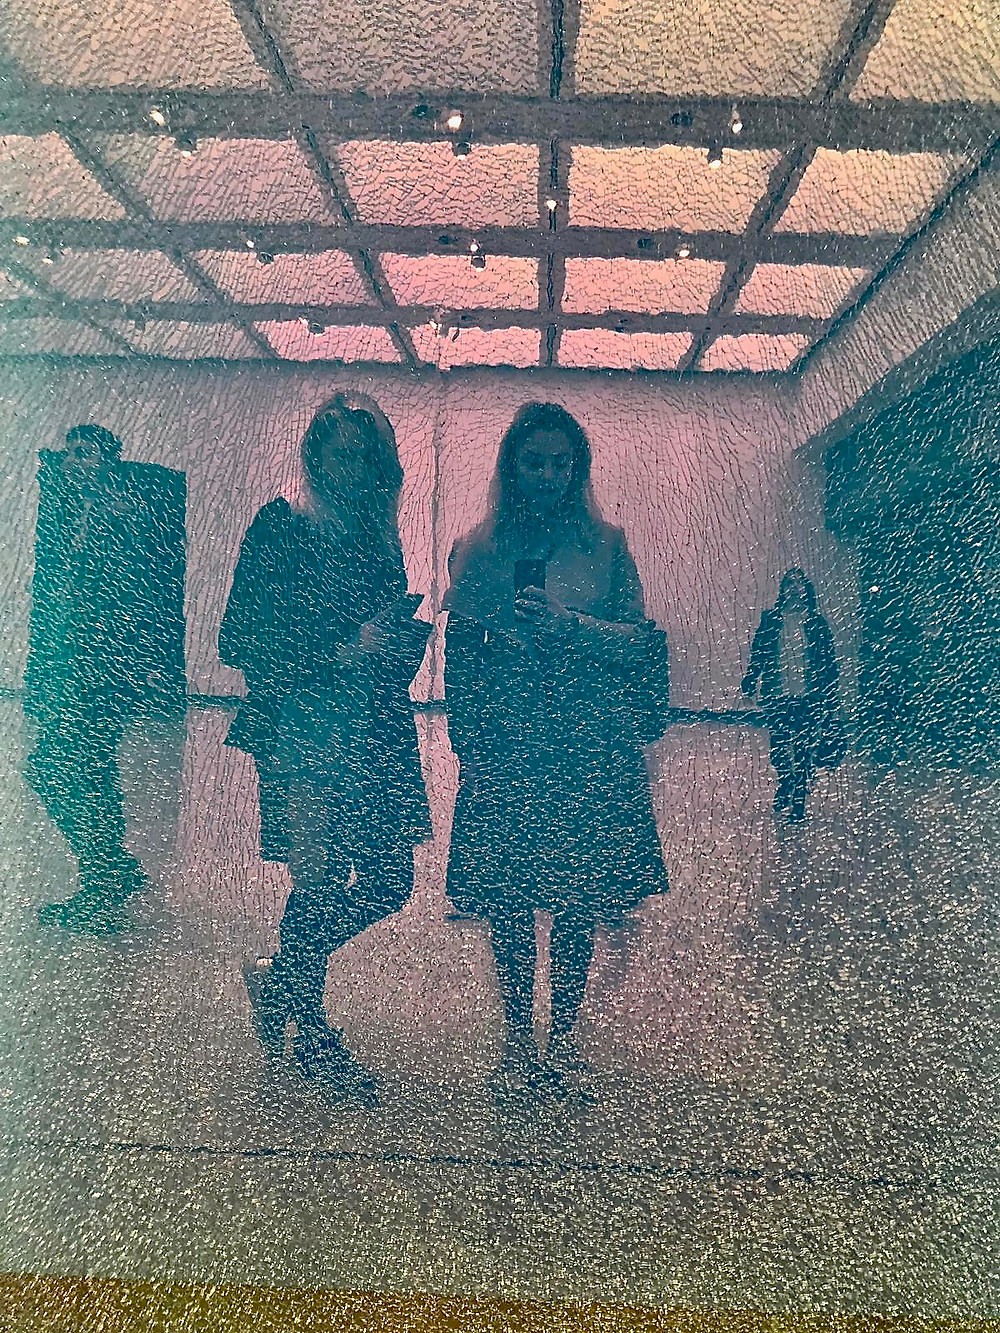 "Ann Veronica Janssens ""Magic Mirror (Pink #2), 2013-17"